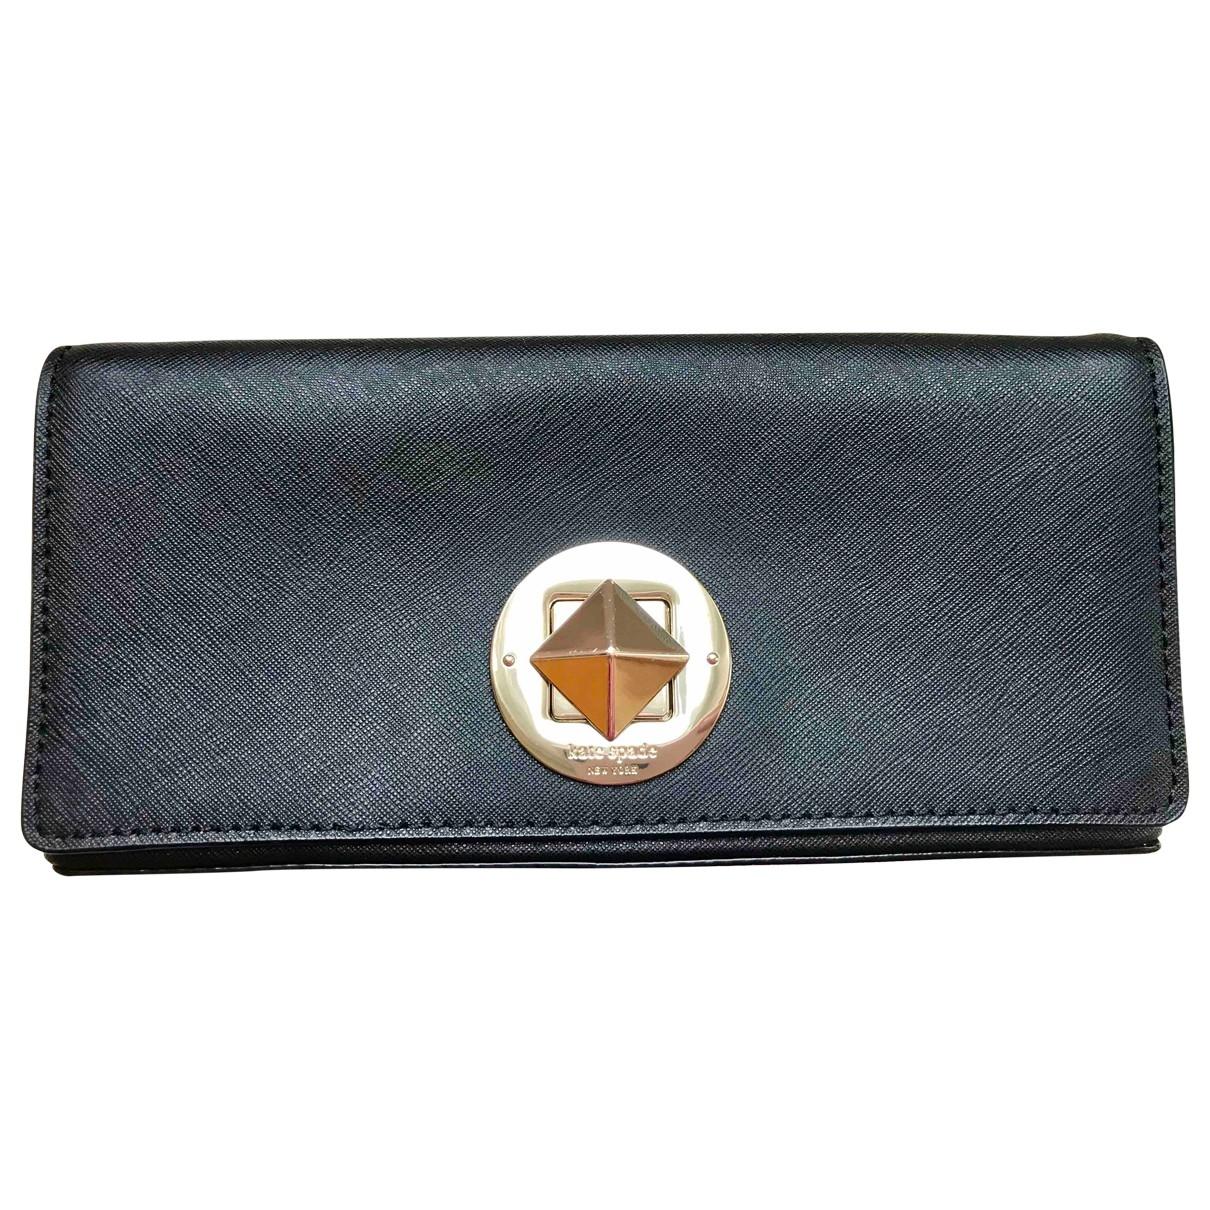 Kate Spade \N Black Leather Clutch bag for Women \N